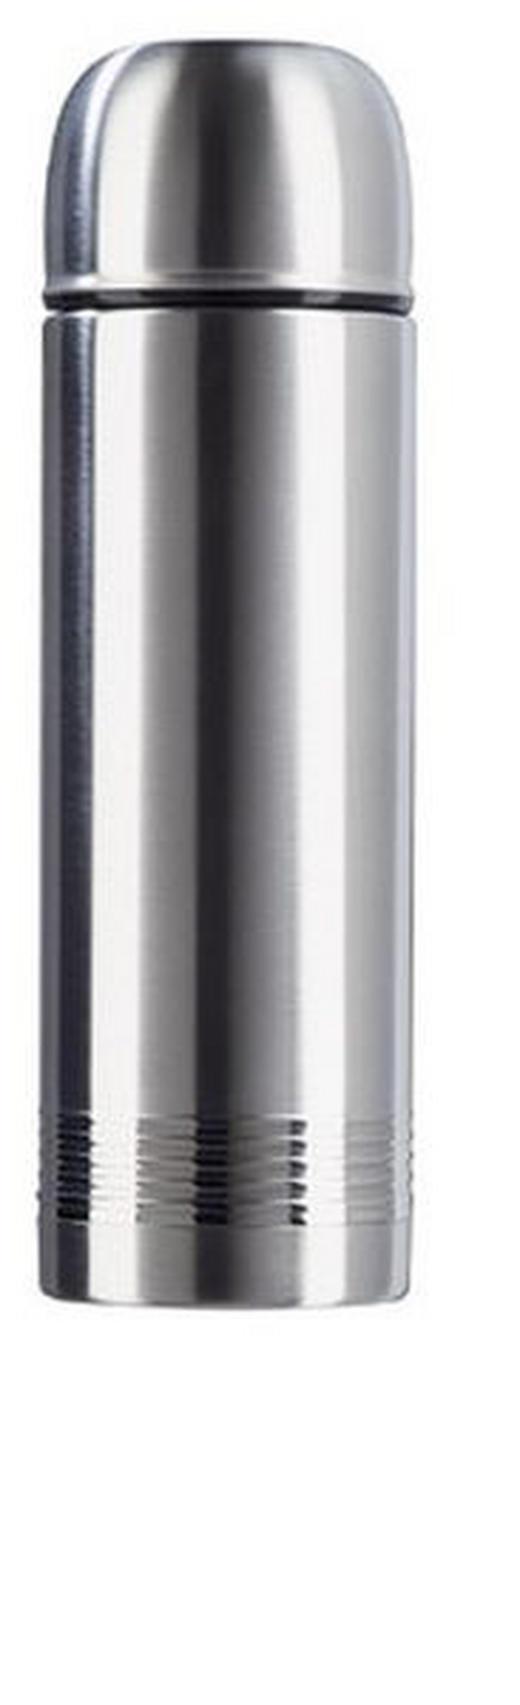 ISOLIERFLASCHE 1,0 L - Edelstahlfarben, Basics, Metall (1l) - EMSA